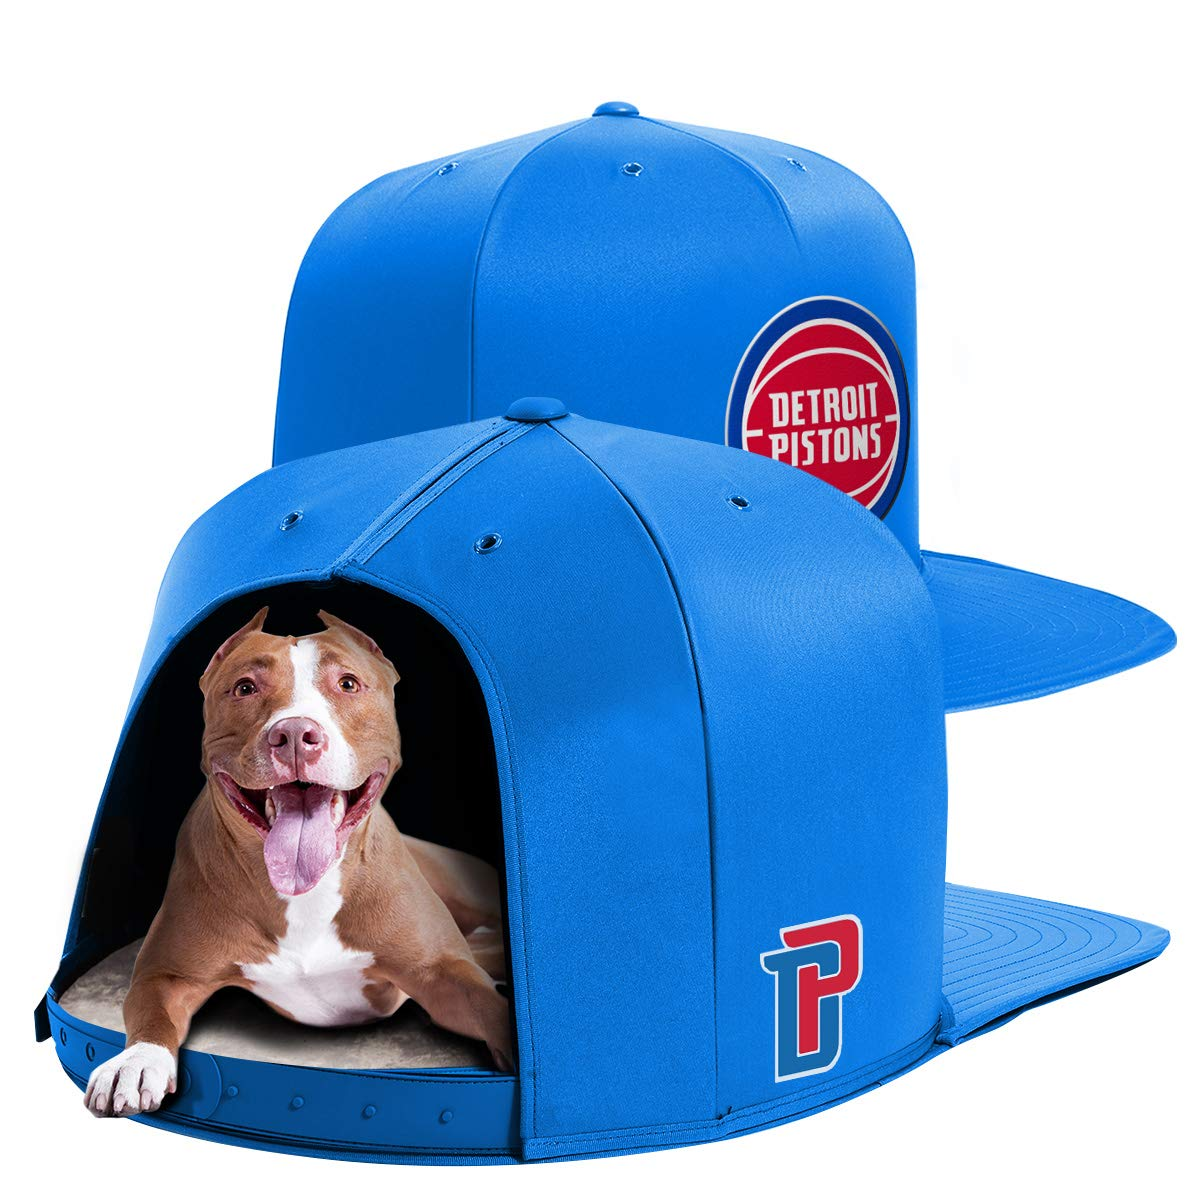 NAP CAP NBA Detroit Pistons Team Indoor Pet Bed, Blue (Large)